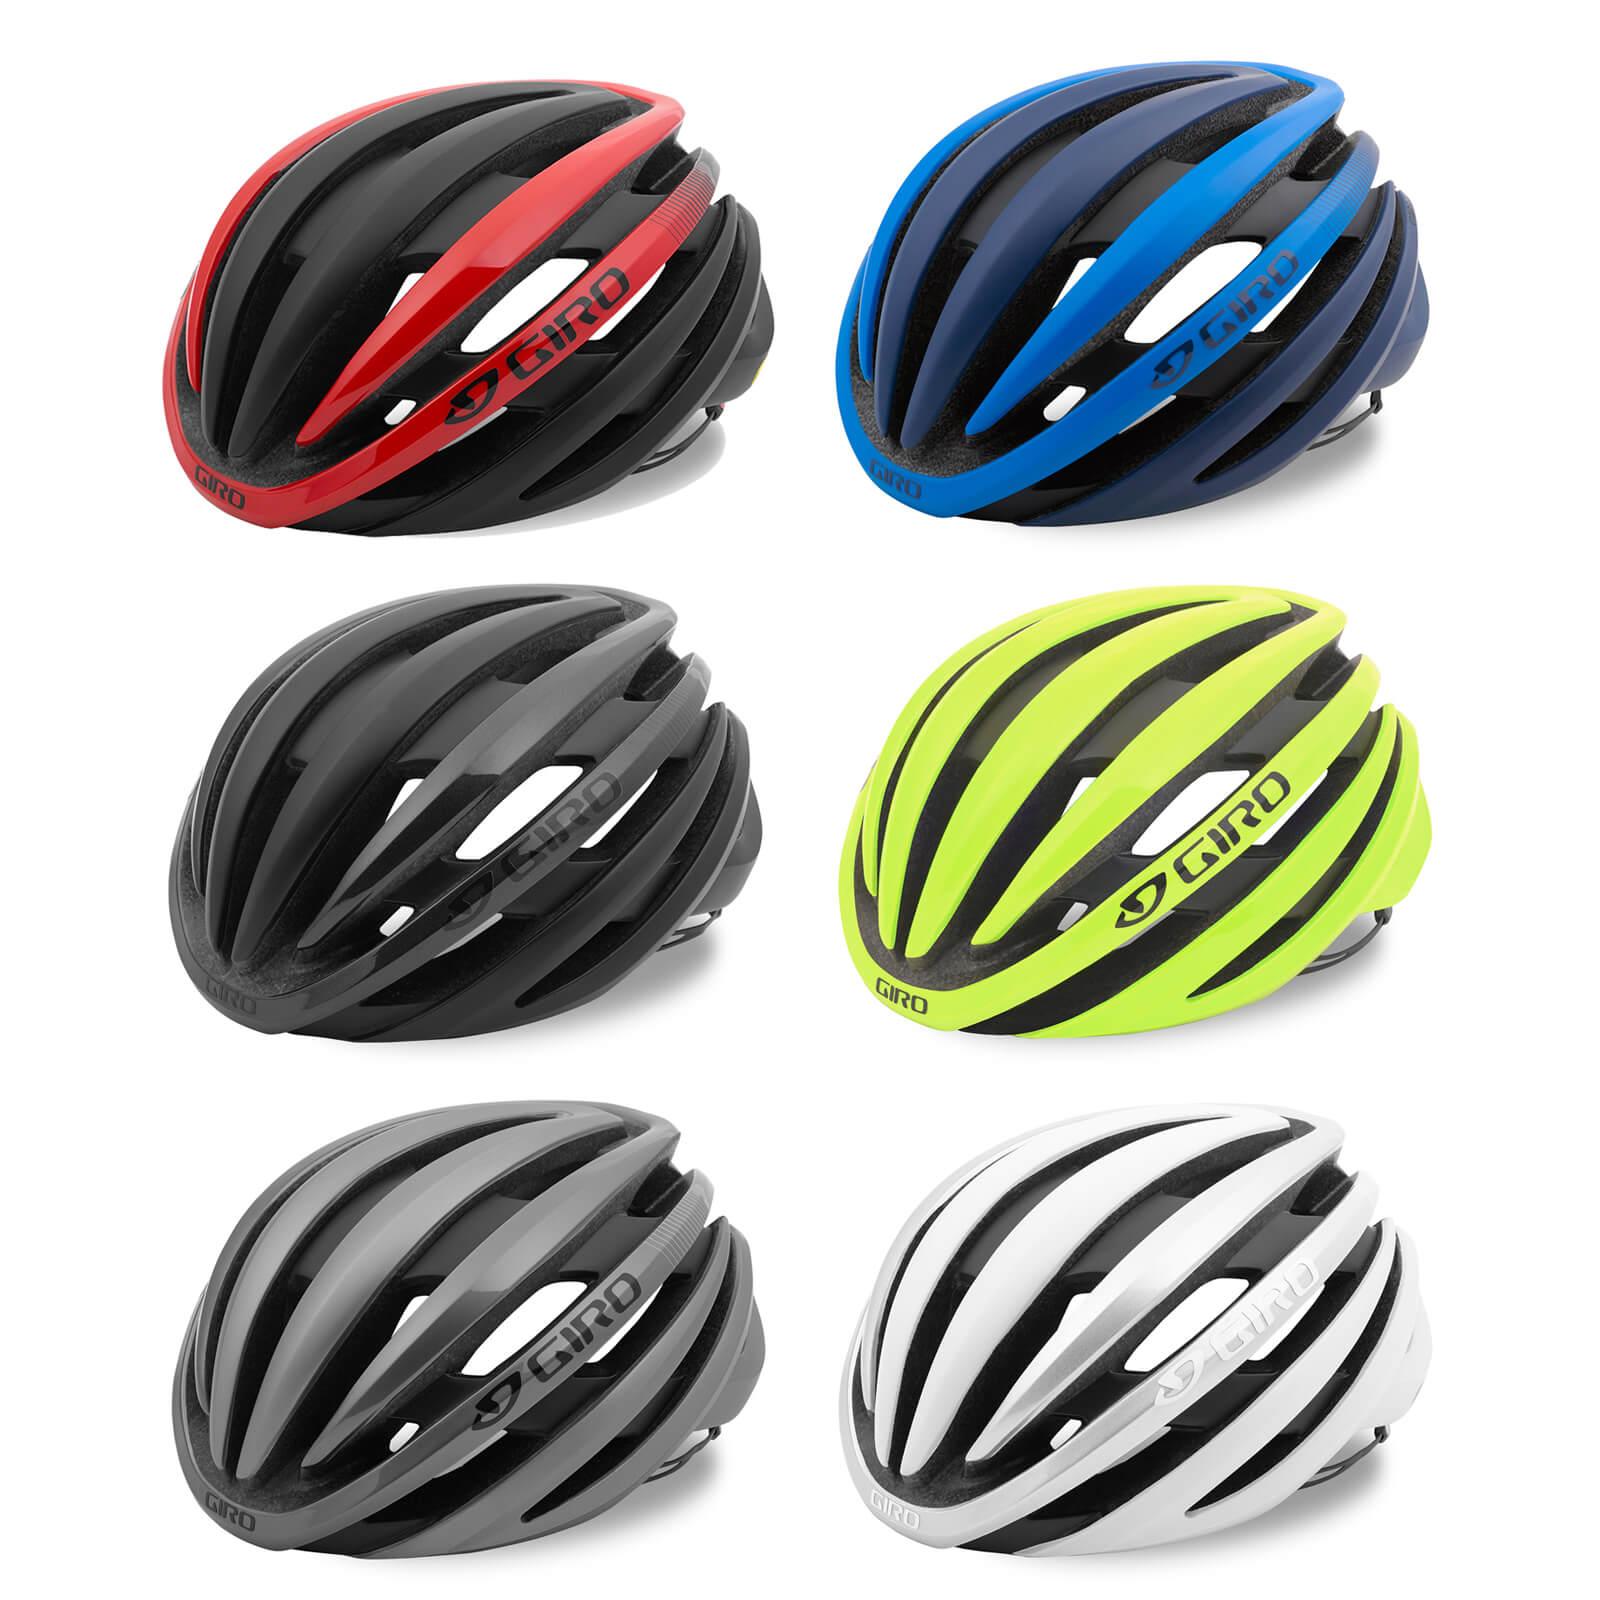 a1bb05e5329 Giro Cinder MIPS Road Helmet - 2019 | ProBikeKit UK